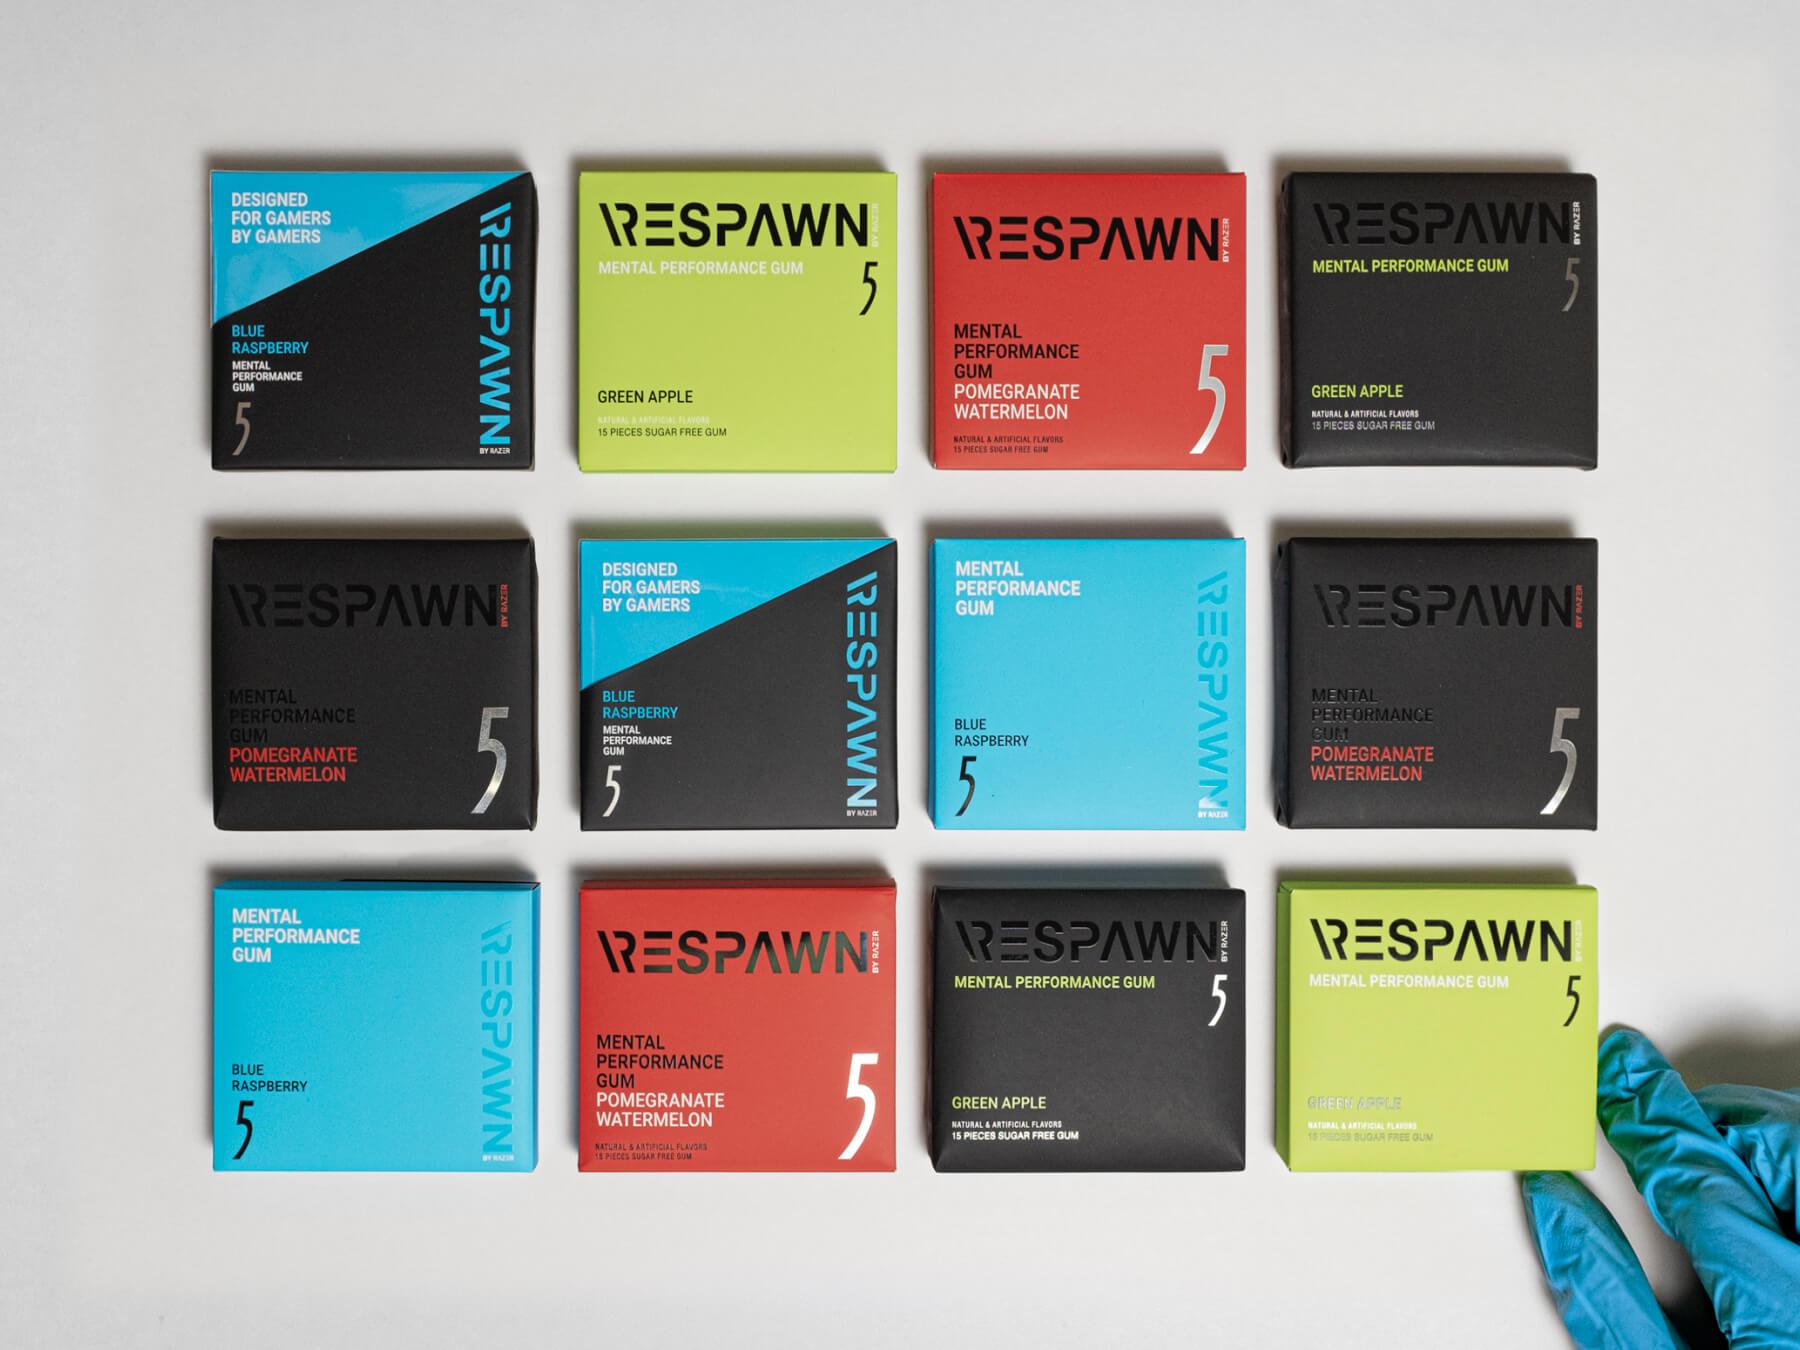 1800w-Respawn-01